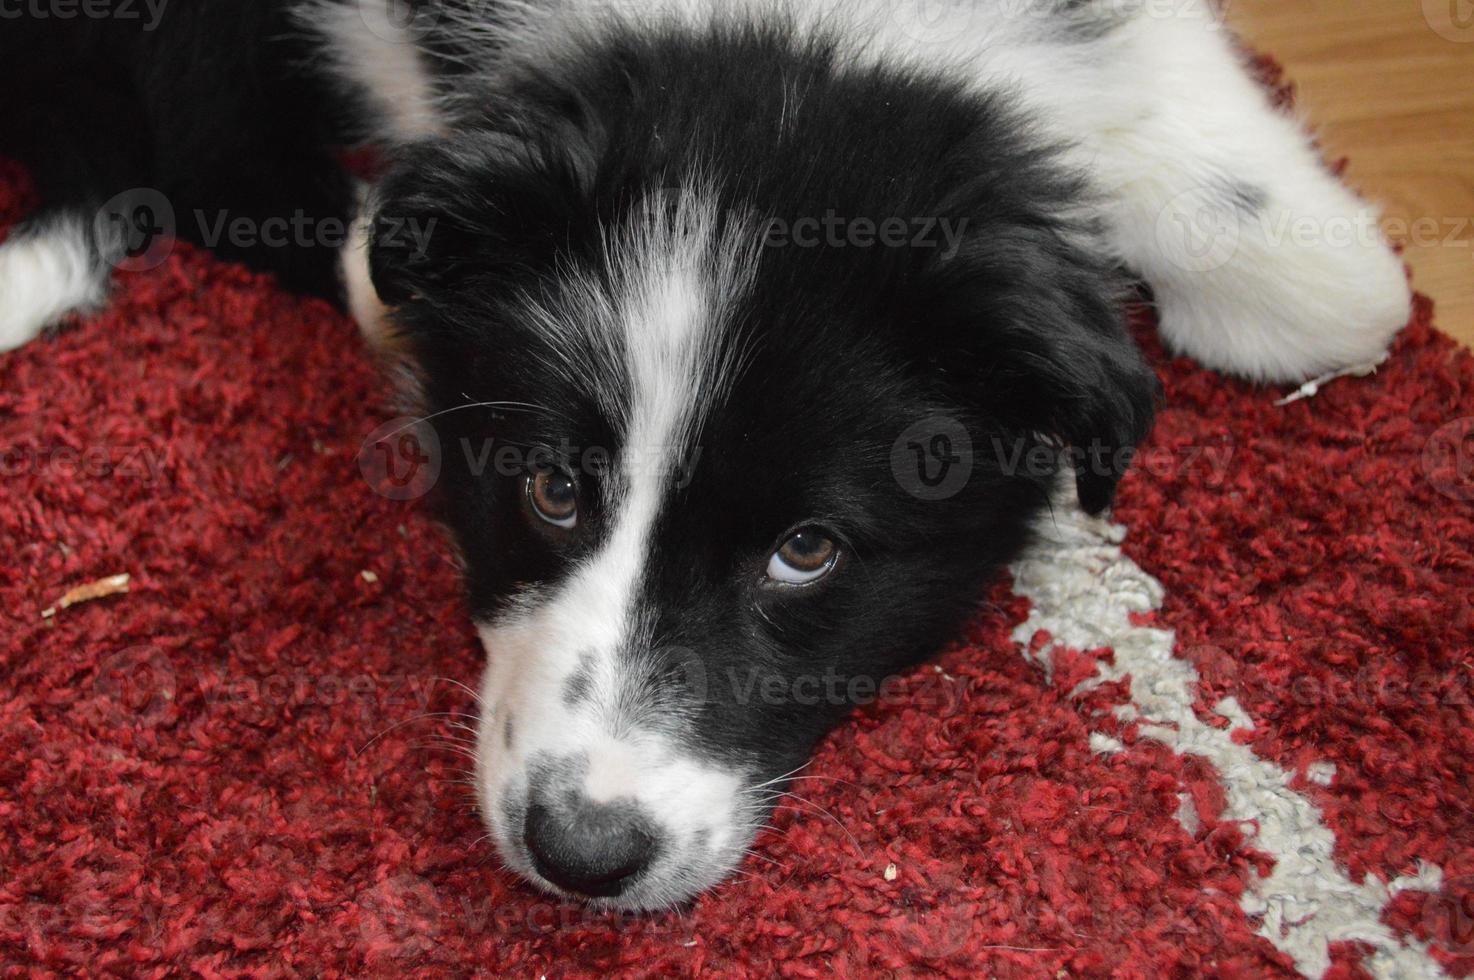 Border Collie cachorro que se establecen foto